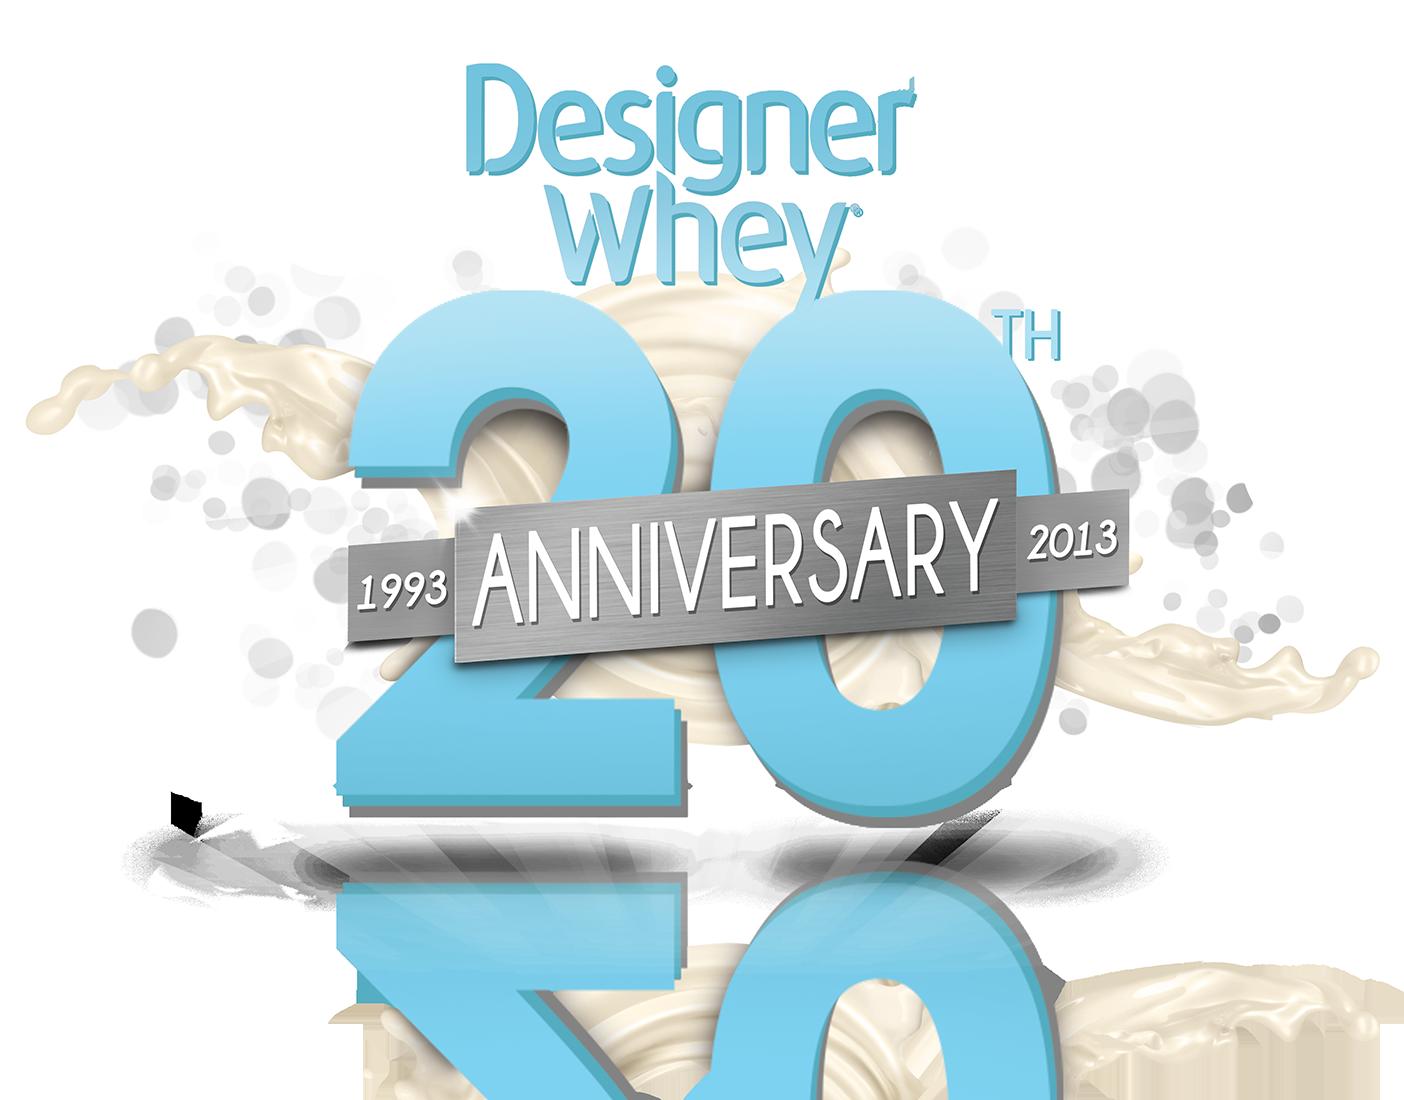 designer whey 20